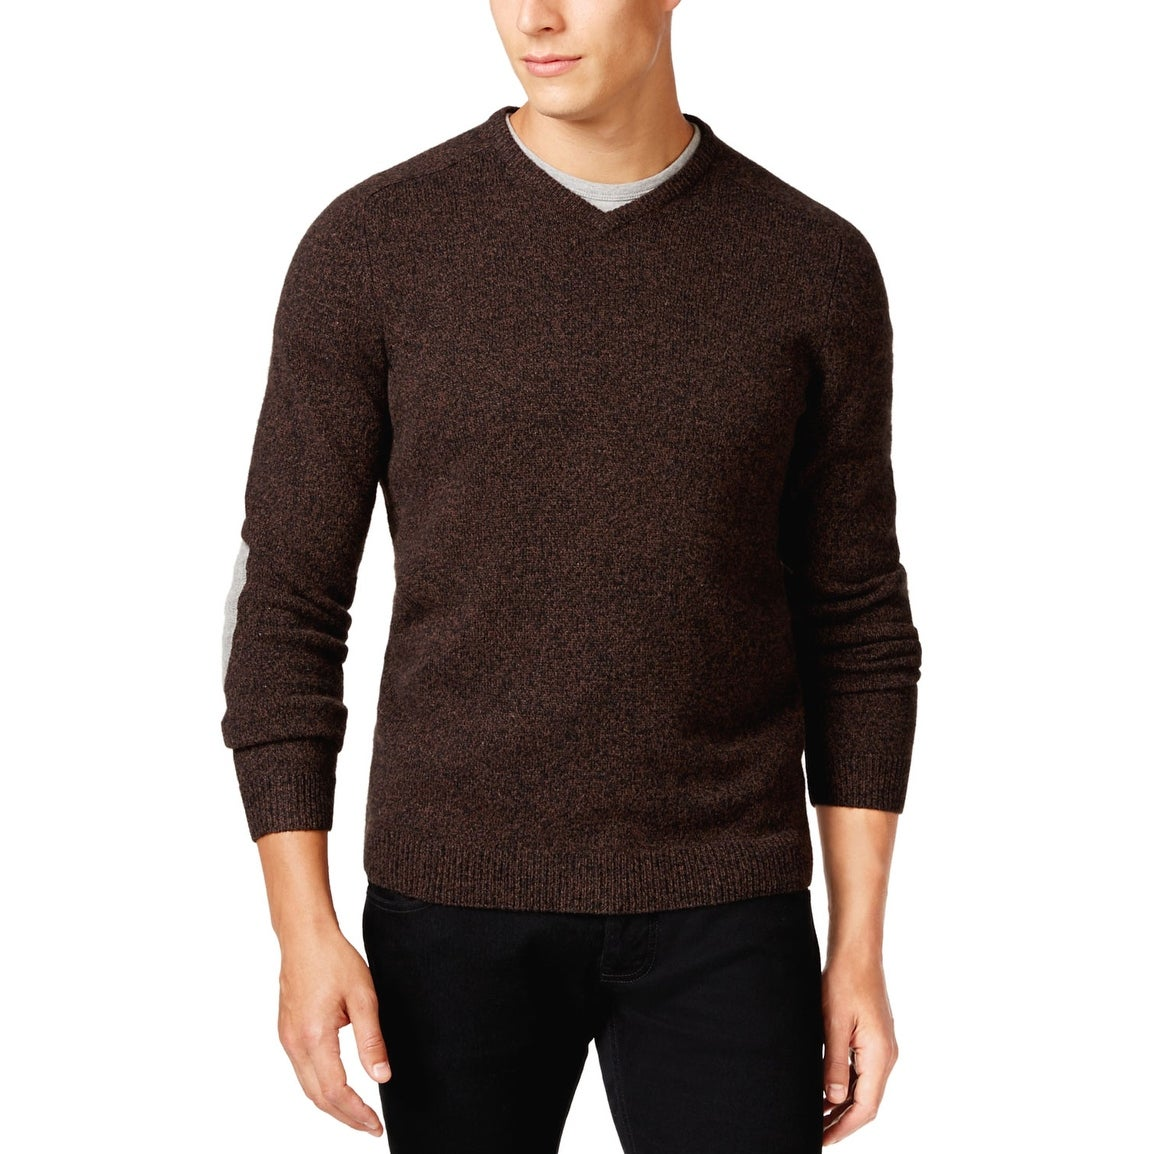 Tasso Elba Mens Cotton Wool Blend Pants